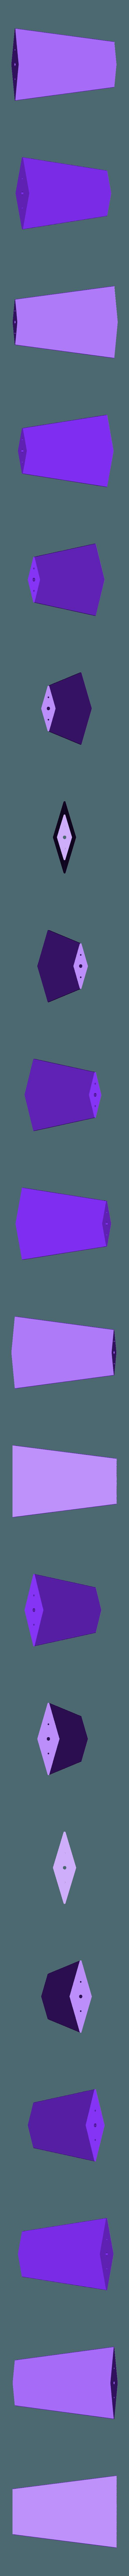 Sharpened Nail 4.stl Download STL file Hollow Knight Sharpened Nail • 3D printable design, glargonoid